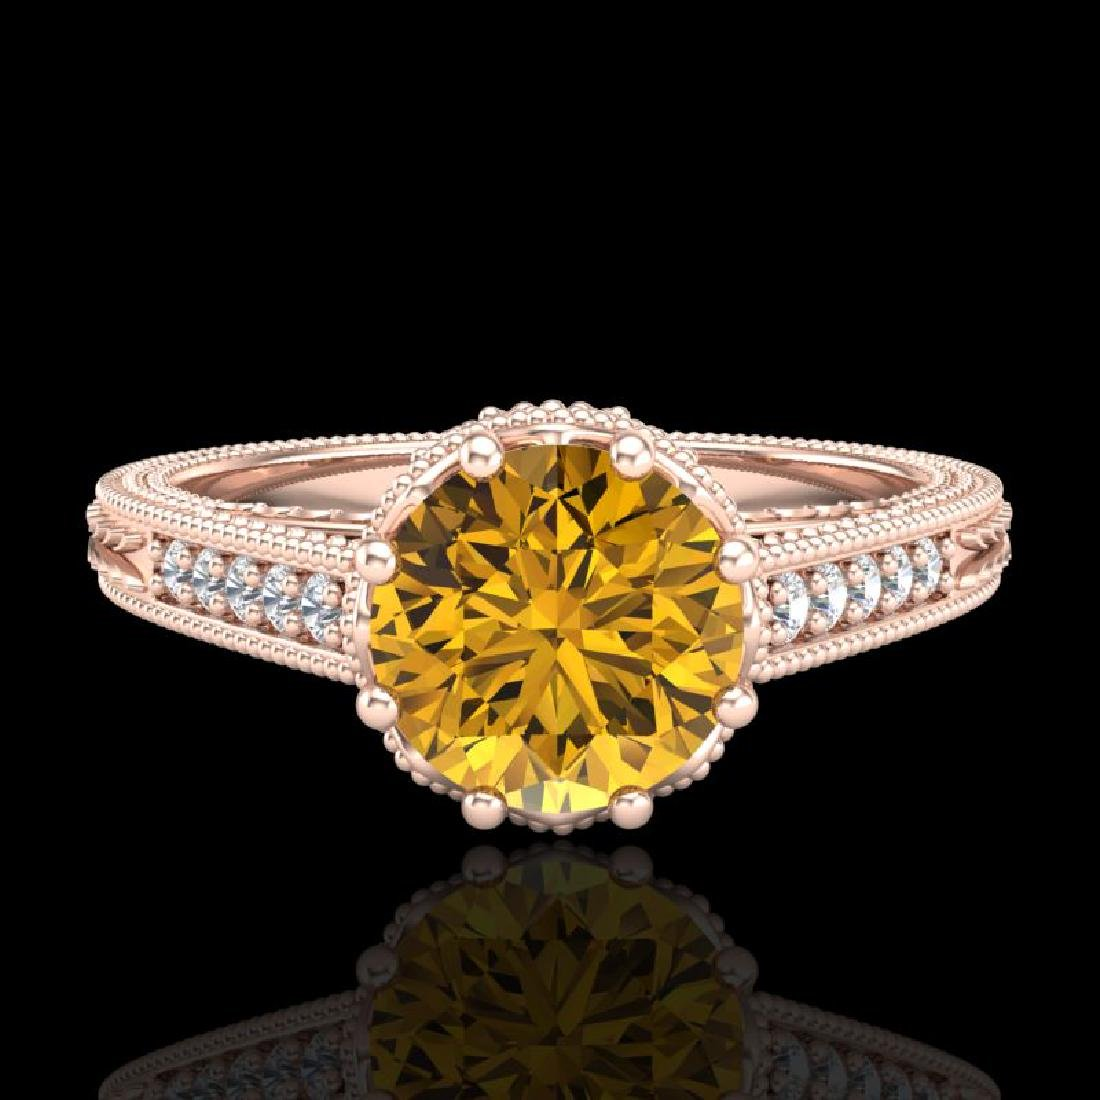 1.25 CTW Intense Fancy Yellow Diamond Engagement Art - 2